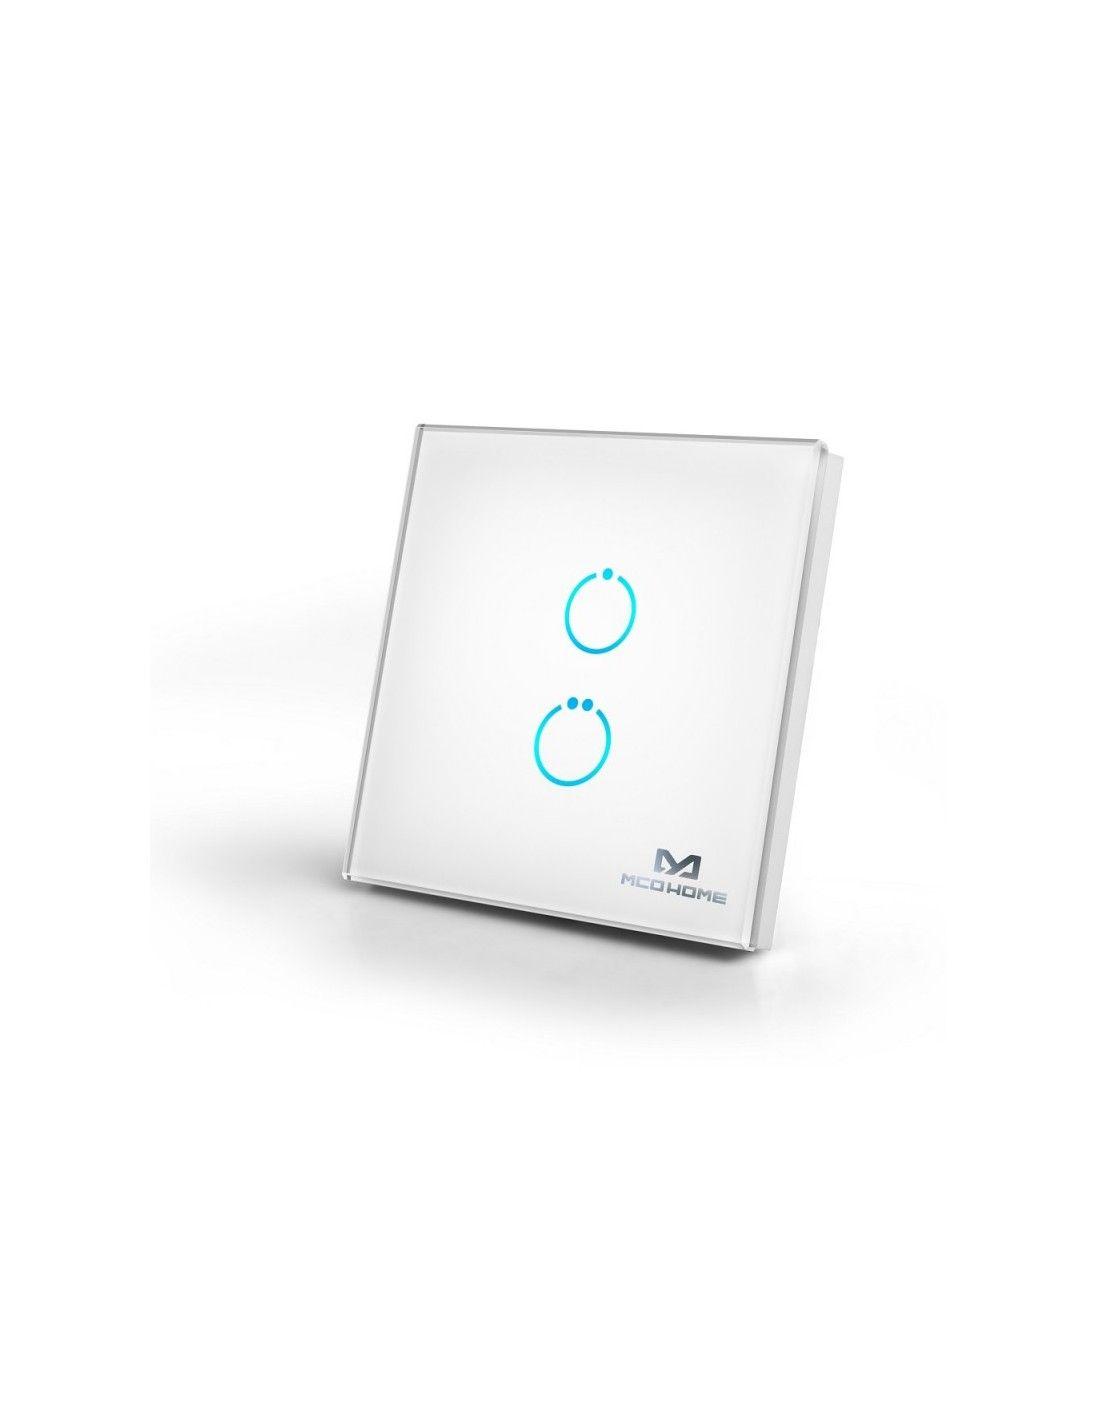 mco home schalter touch panel z wave 2 tasten weiss mh s412. Black Bedroom Furniture Sets. Home Design Ideas